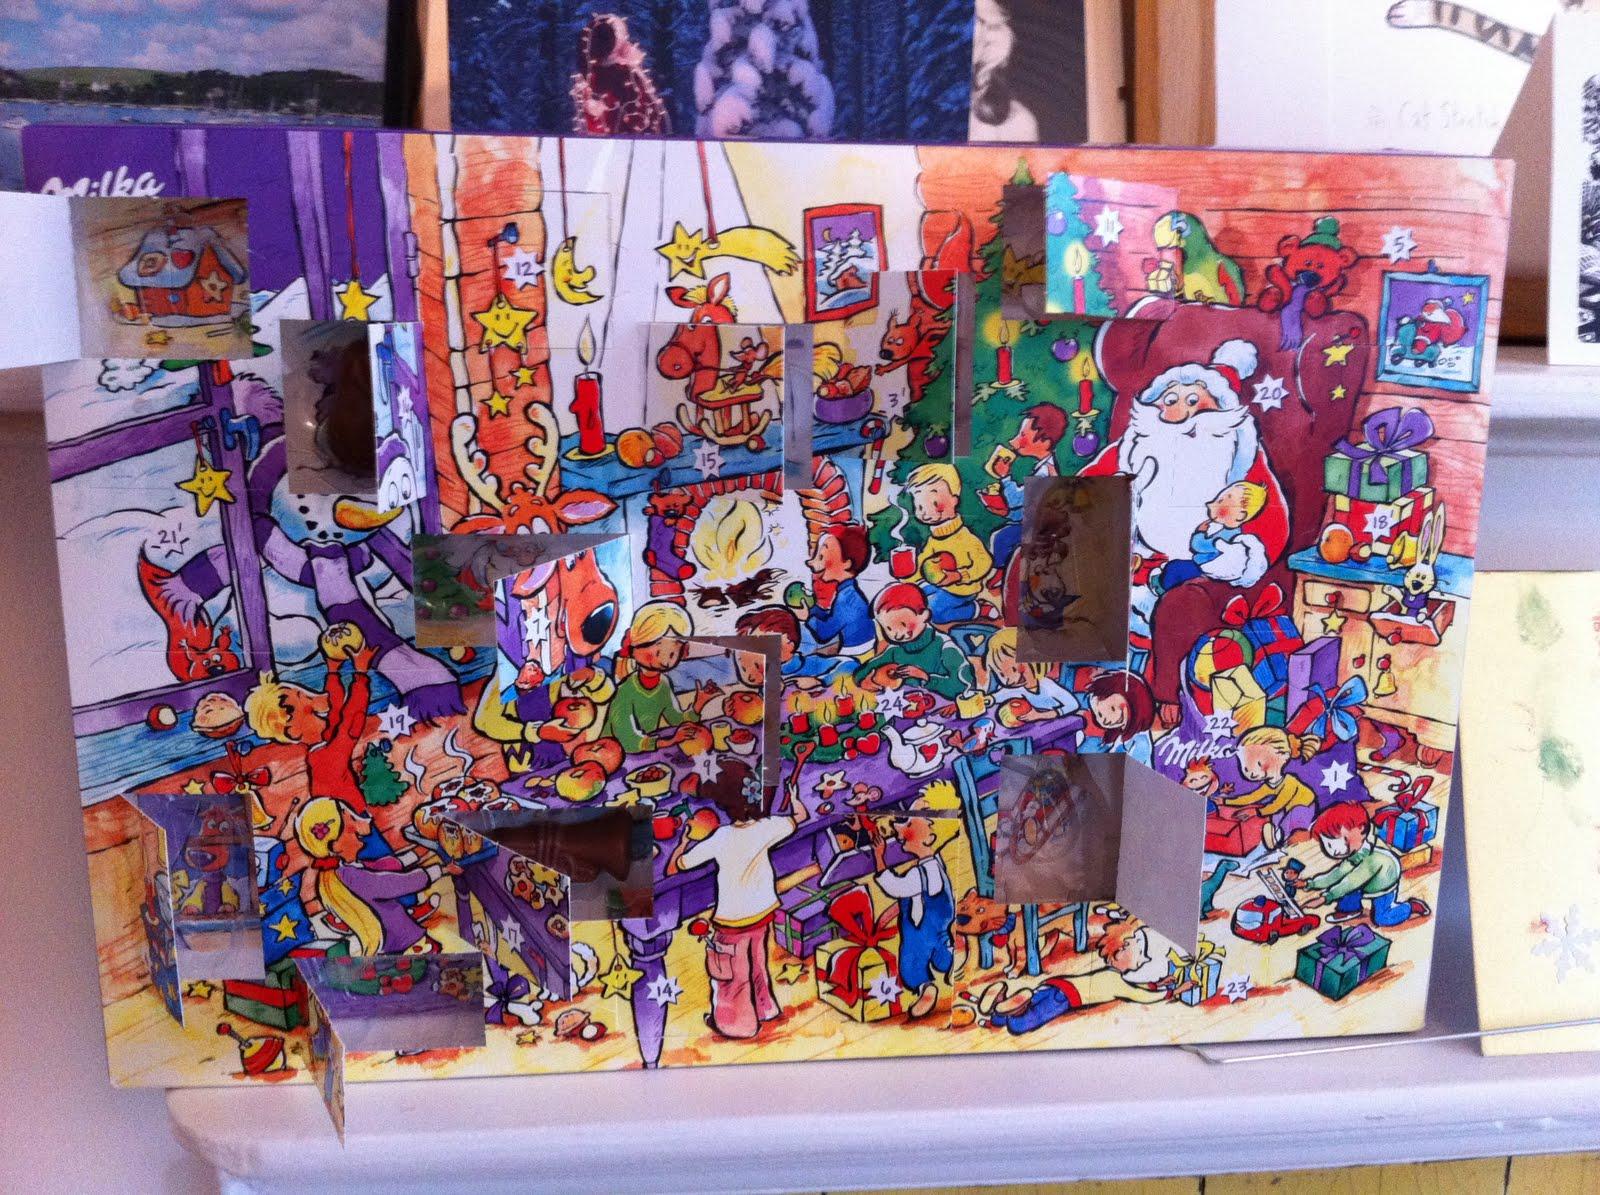 Hils Barker: Advent calendar